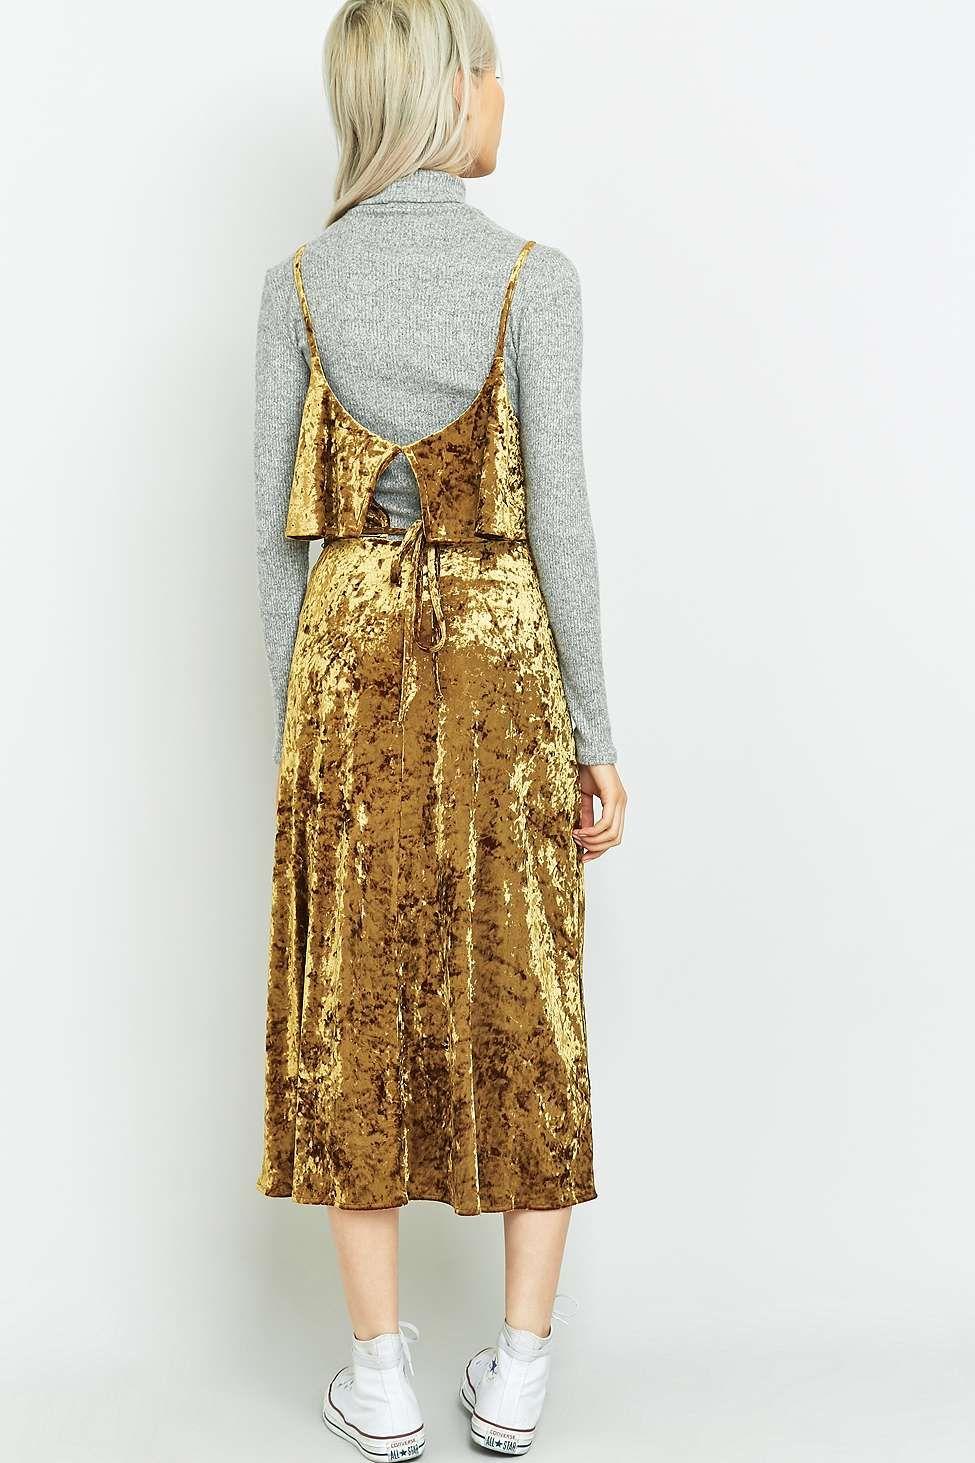 Pins And Needles Clothing Cool Pins & Needles Ruffle Gold Velvet Midi Dress Inspiration Design